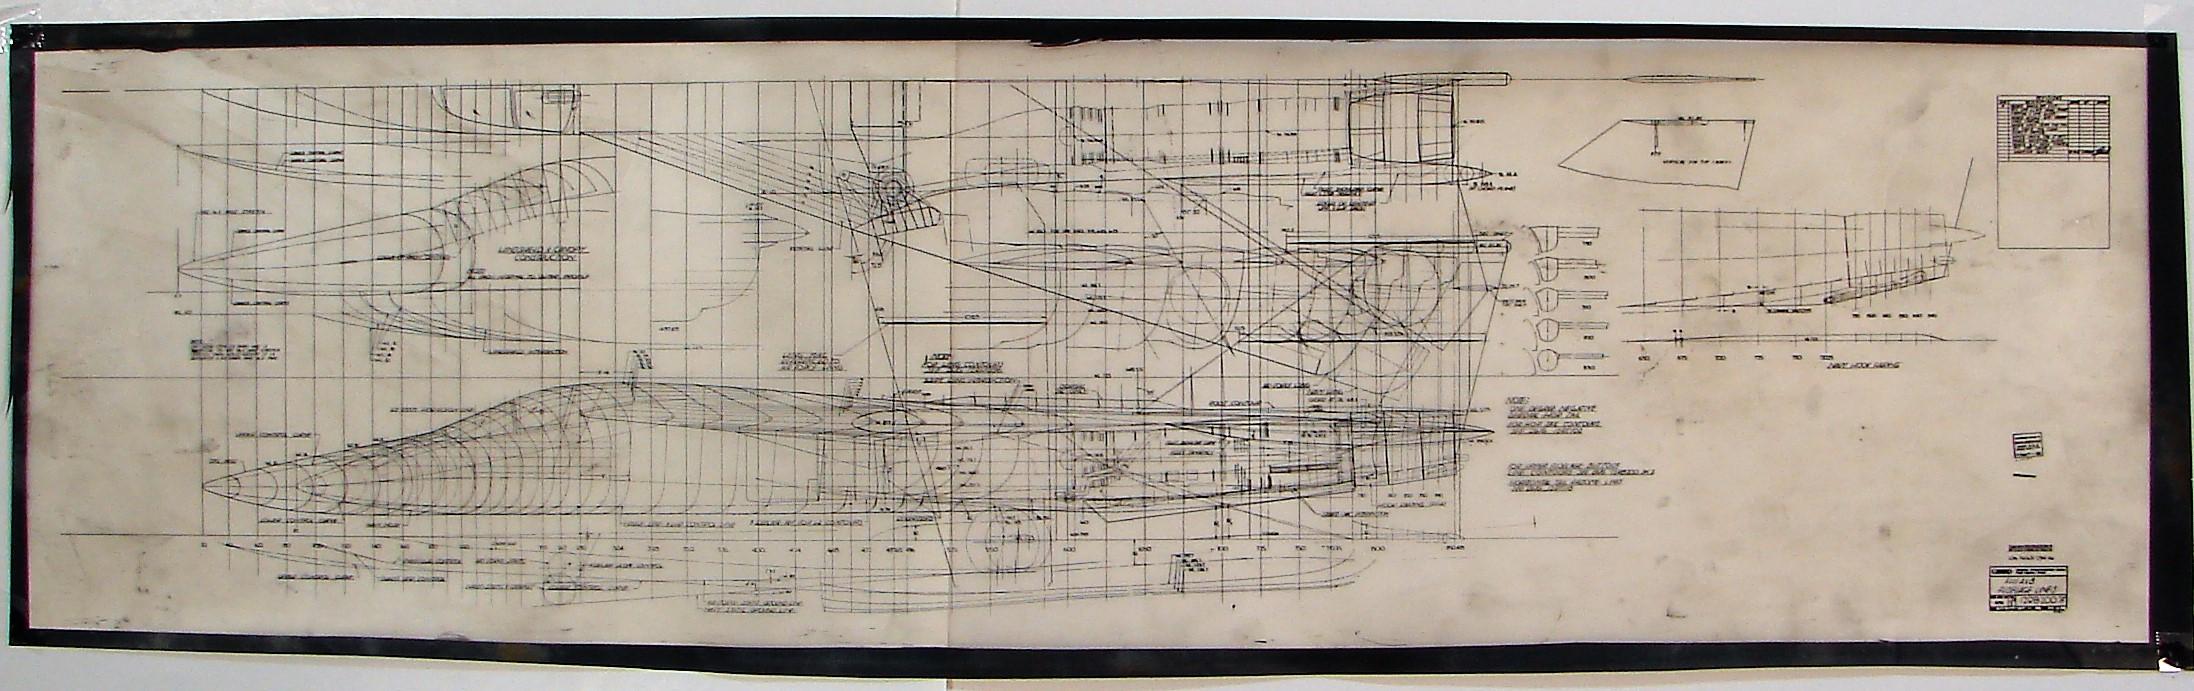 F-111A & B fuselage lines 10.13.66